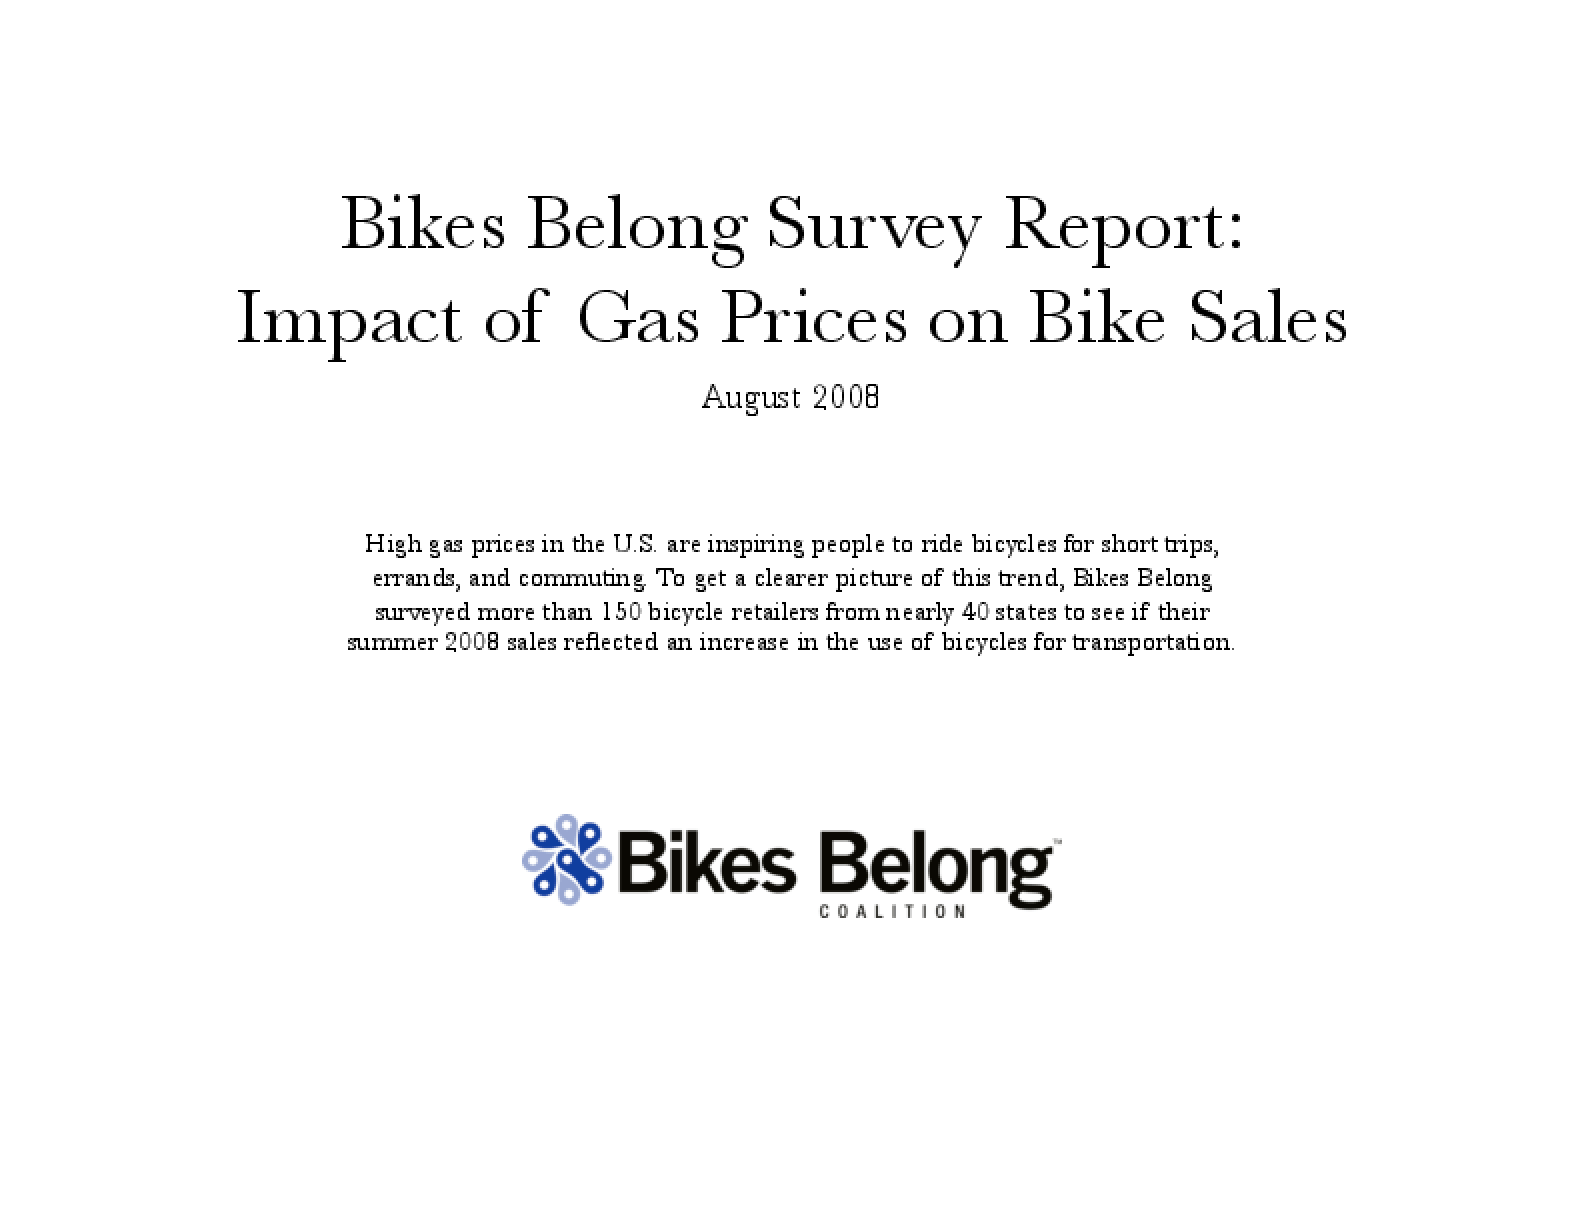 Gas Prices/Bike Sales Survey